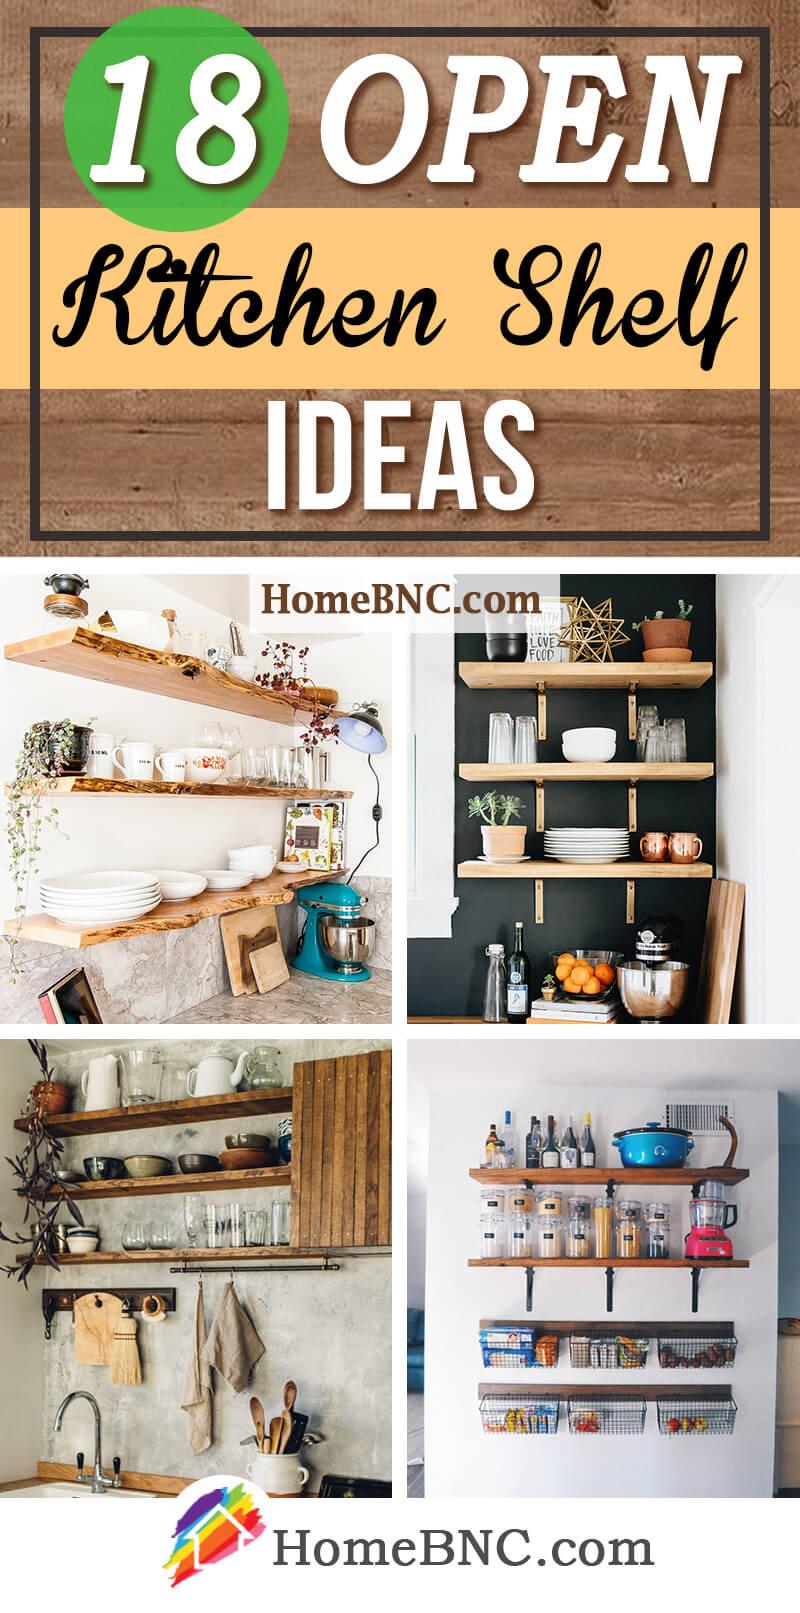 Open Kitchen Shelf Ideas